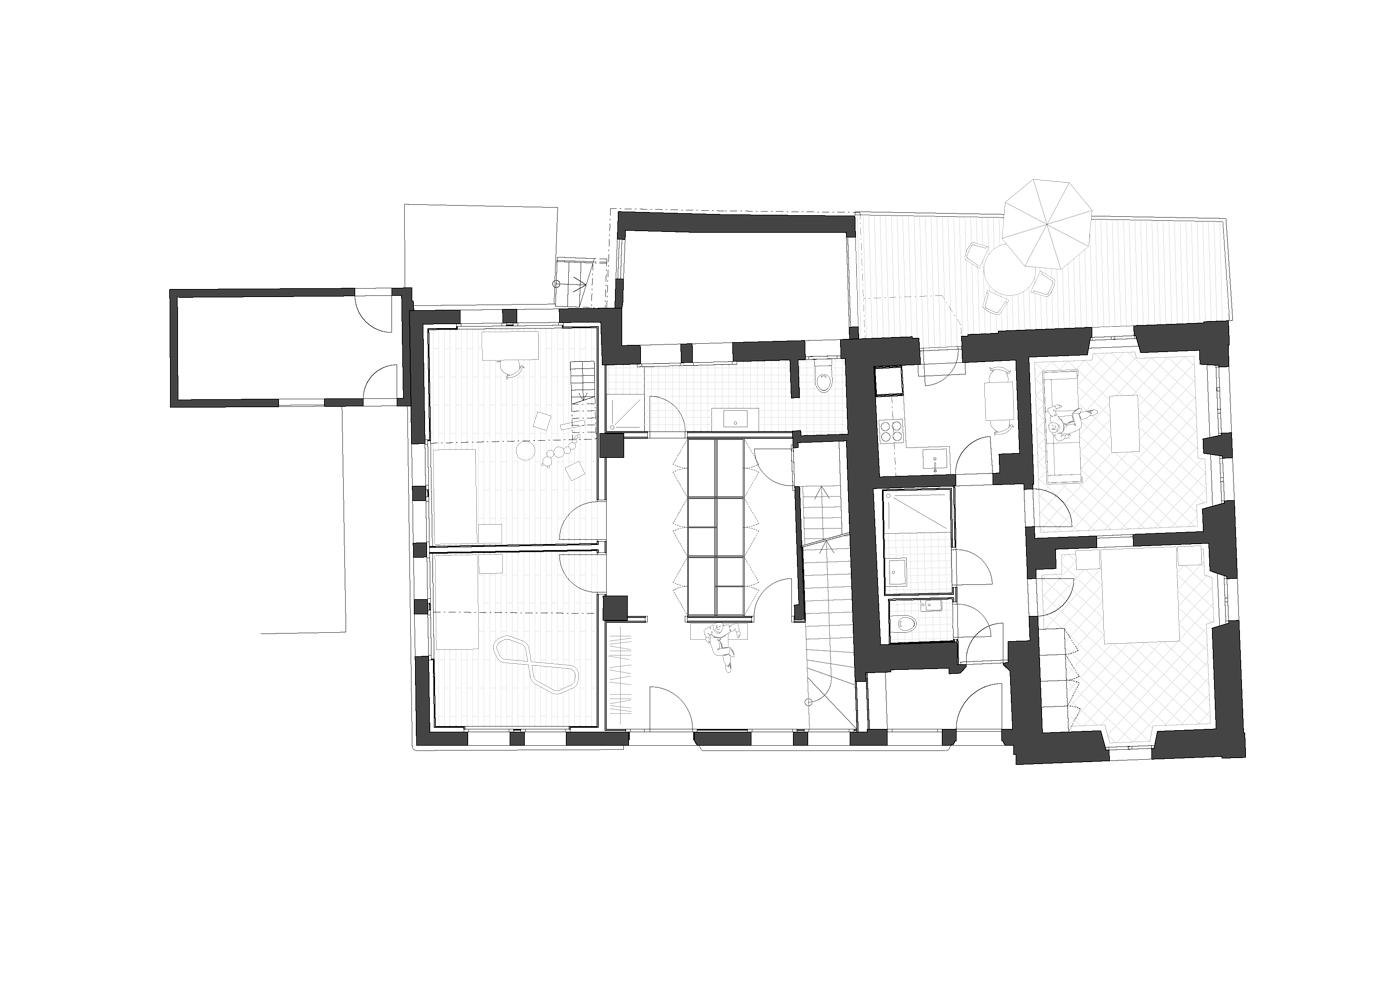 Buan Architekten Umbau Bernstrasse Luzern Grundriss Erdgeschoss